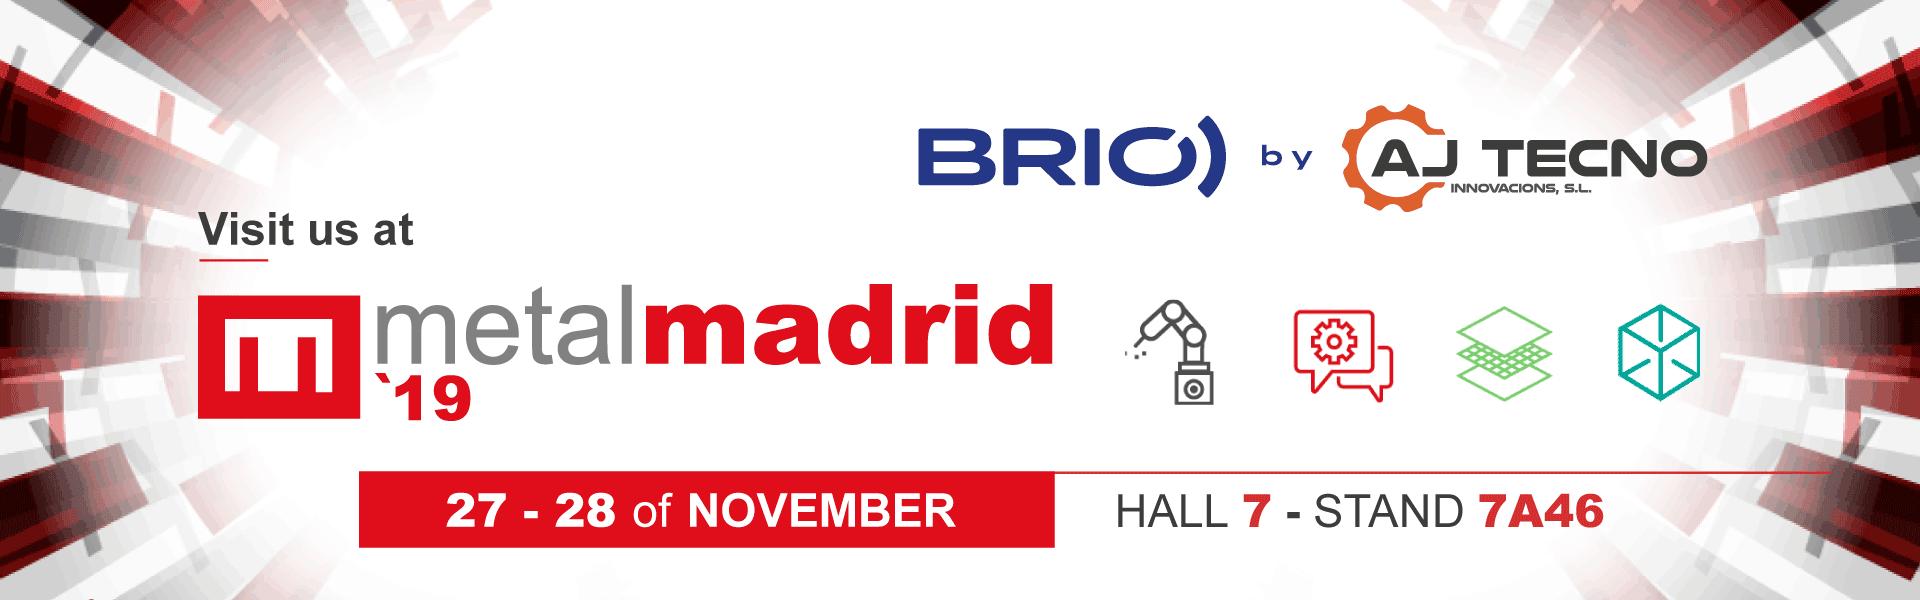 Header news BRIO ultrasonic cleaning Metalmadrid 2019 fair